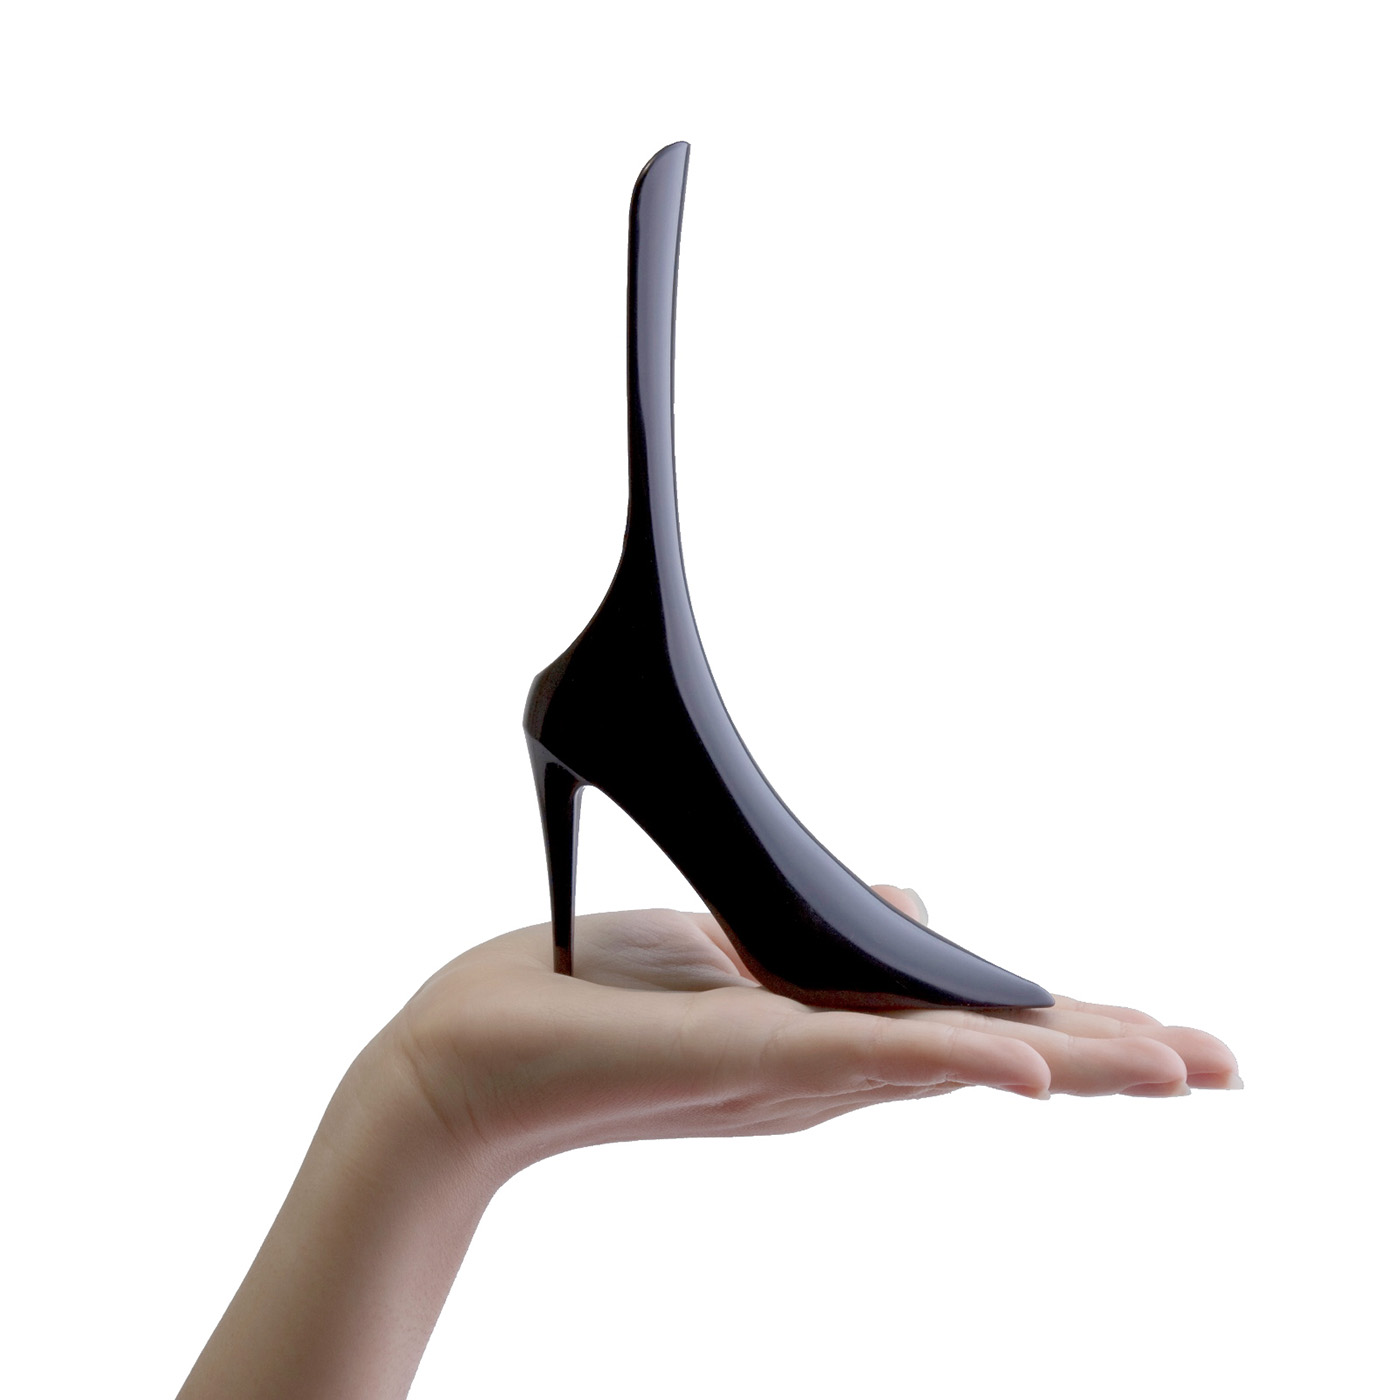 3ce038521bf Κόκκαλο Παπουτσιών Cindy (Διαφανές) - Qualy | Design Is This